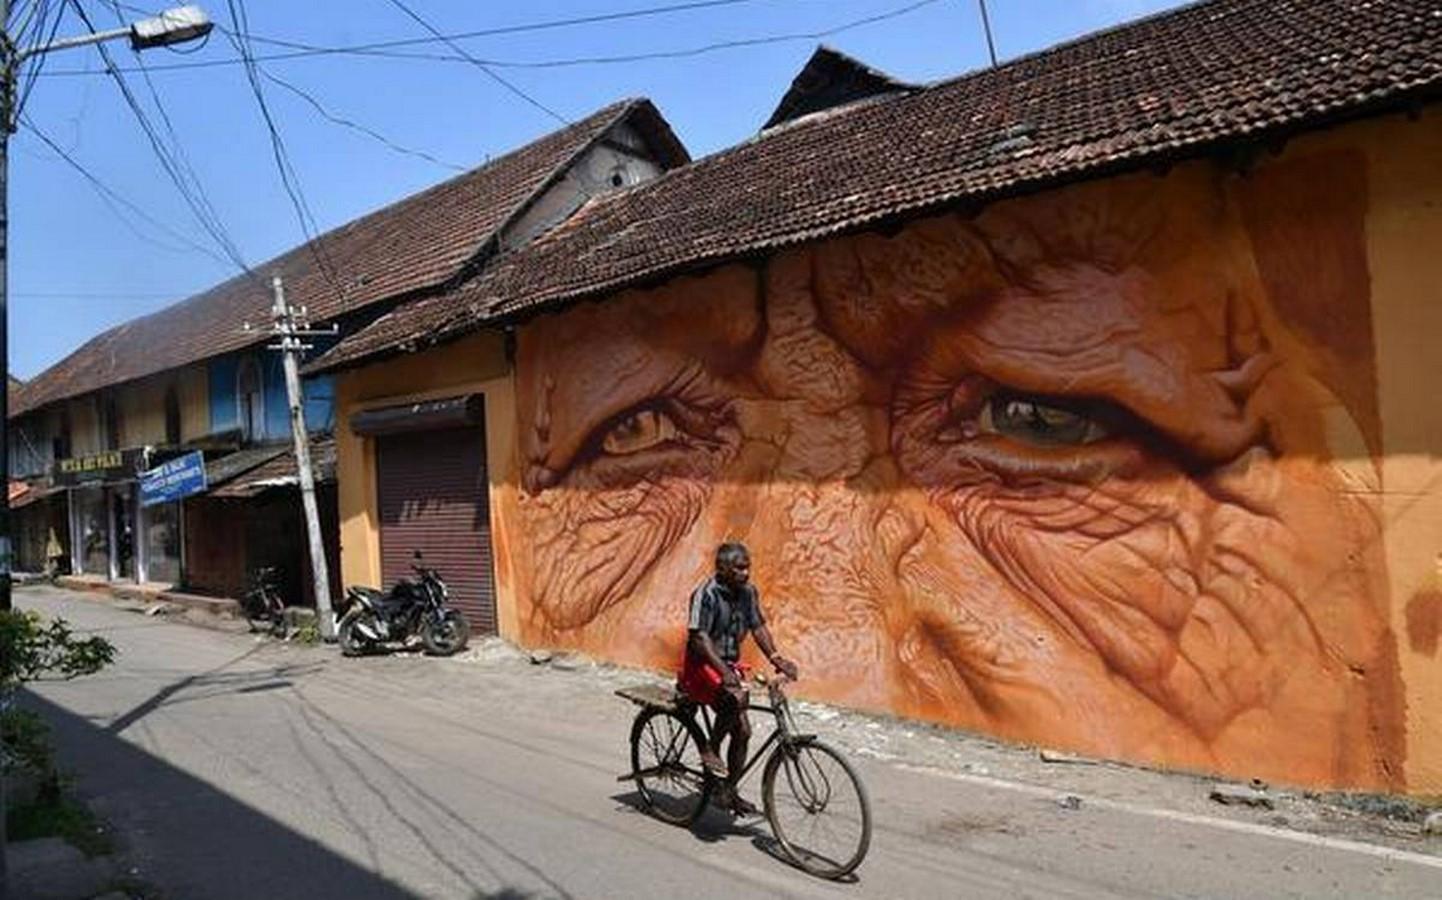 Kochi-Muzris Biennale: The face of Contemporary Art in India - Sheet2